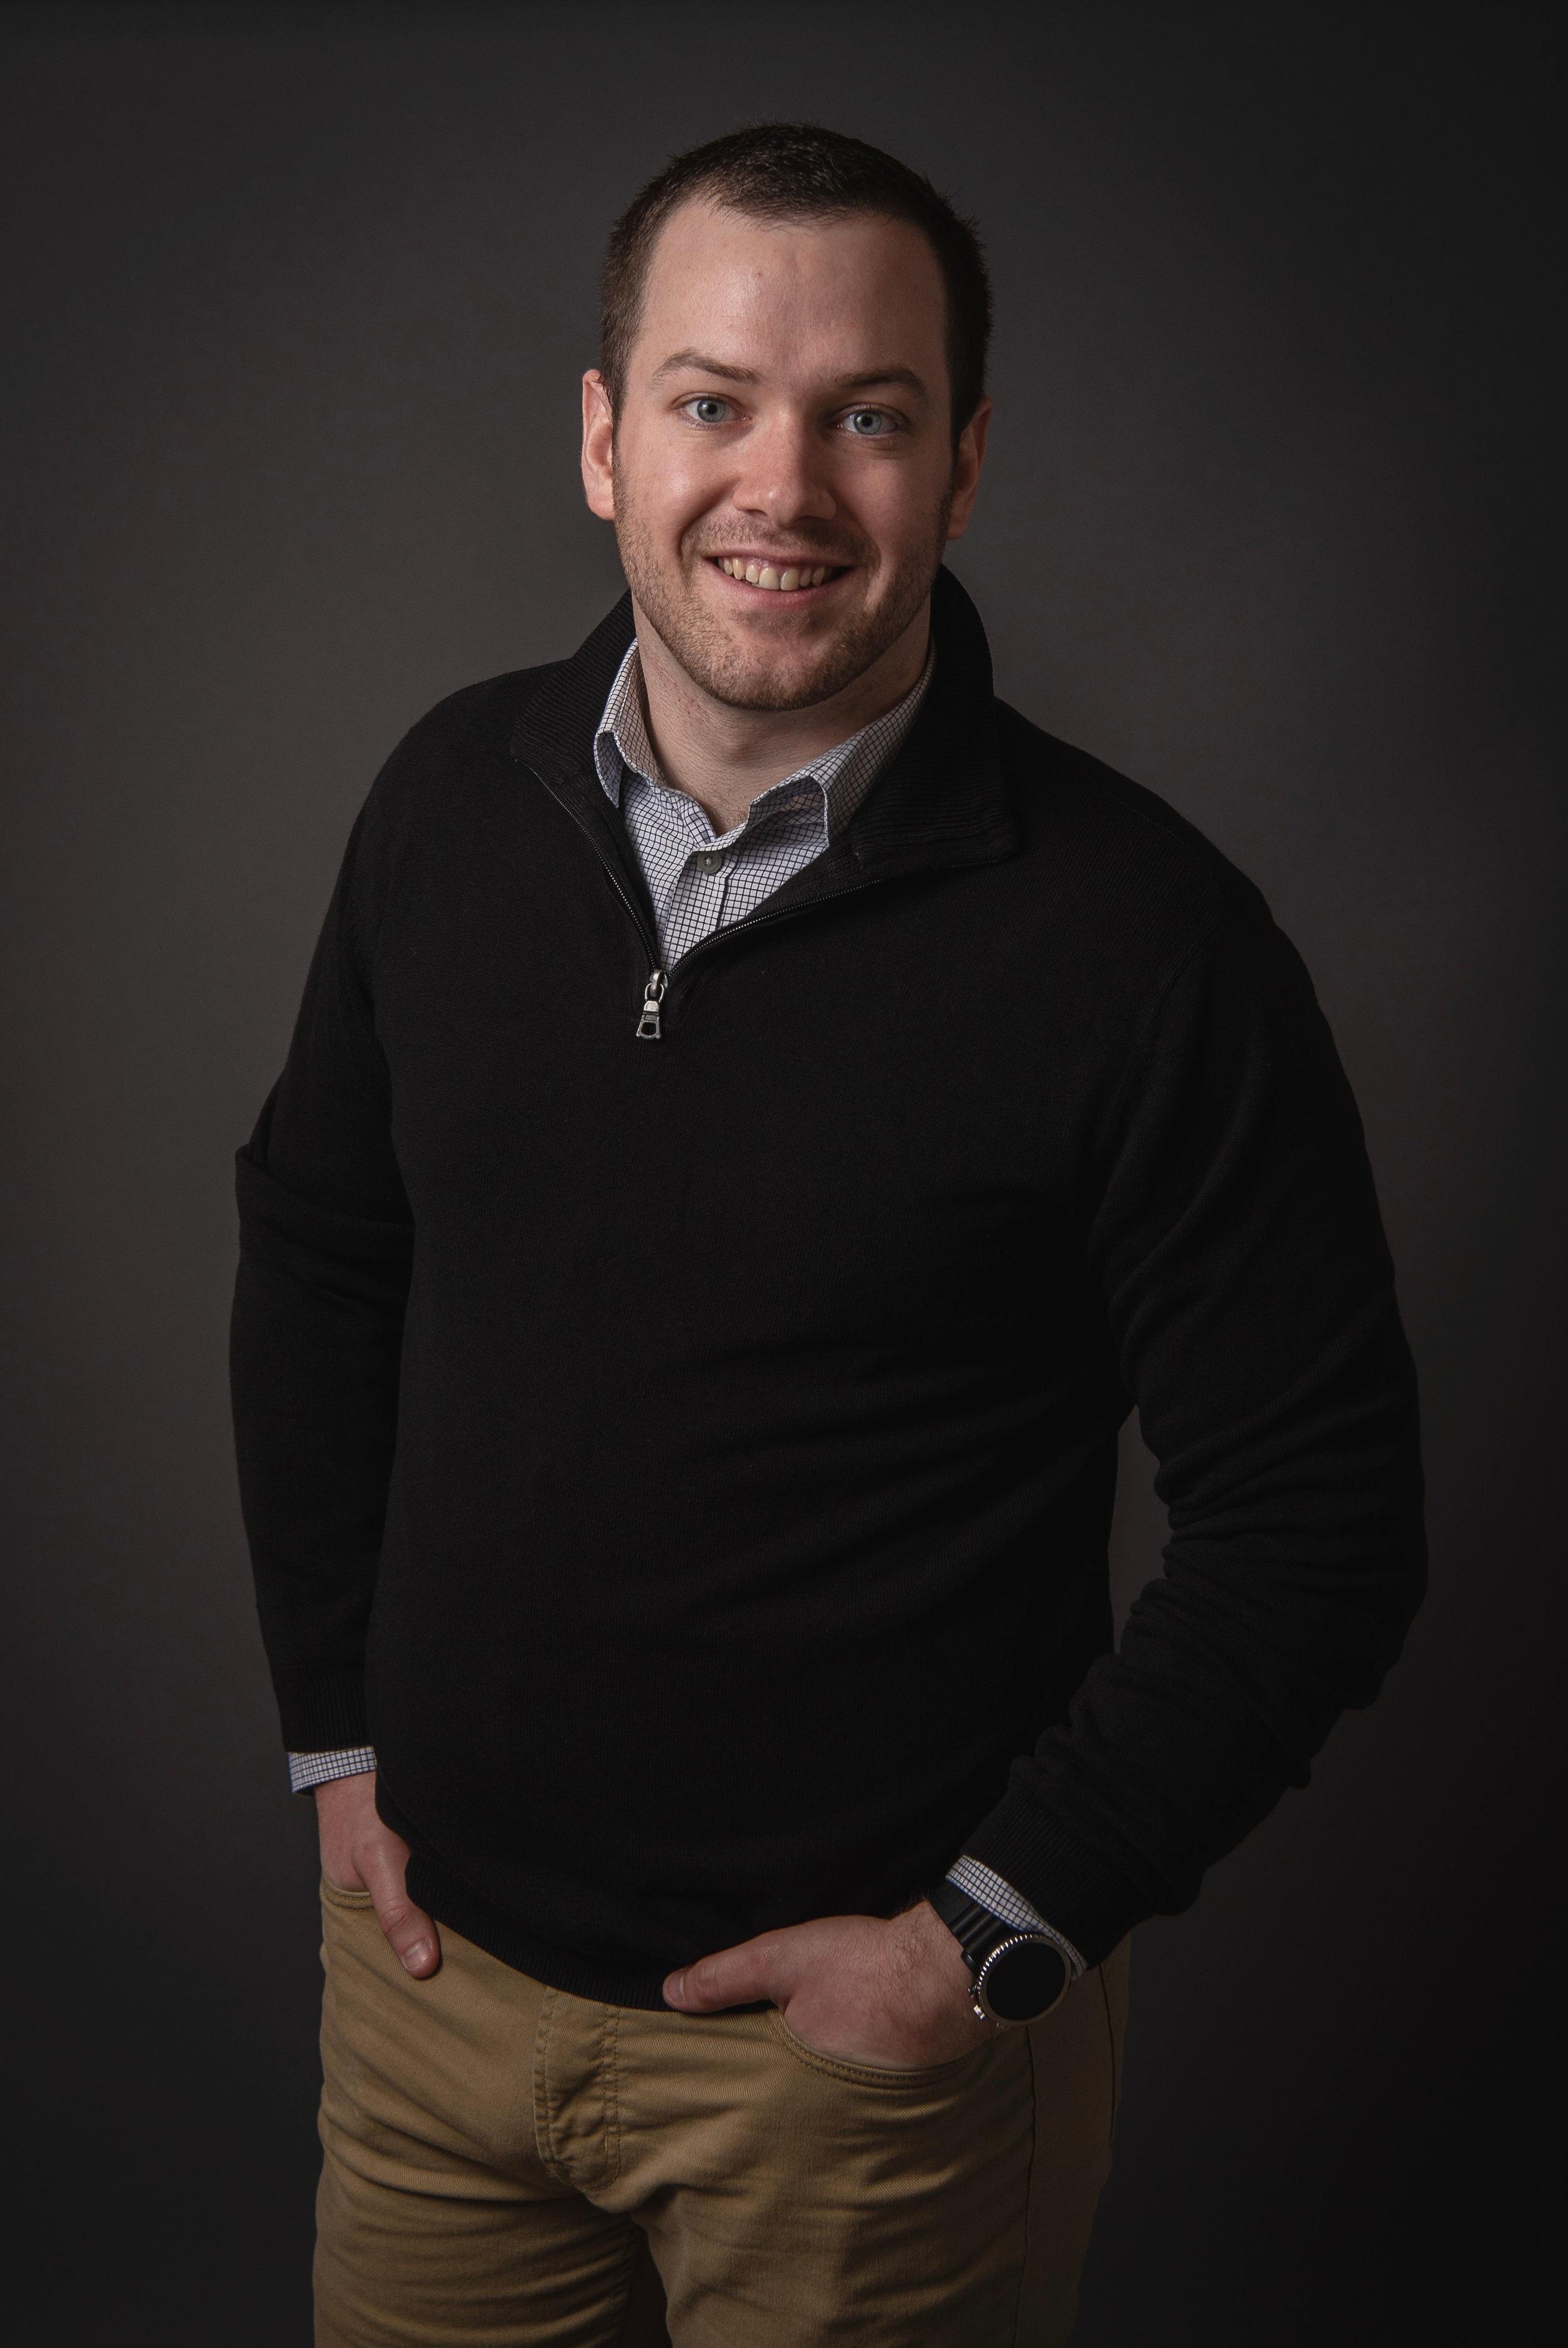 Jacob Morris | Owner & Producer